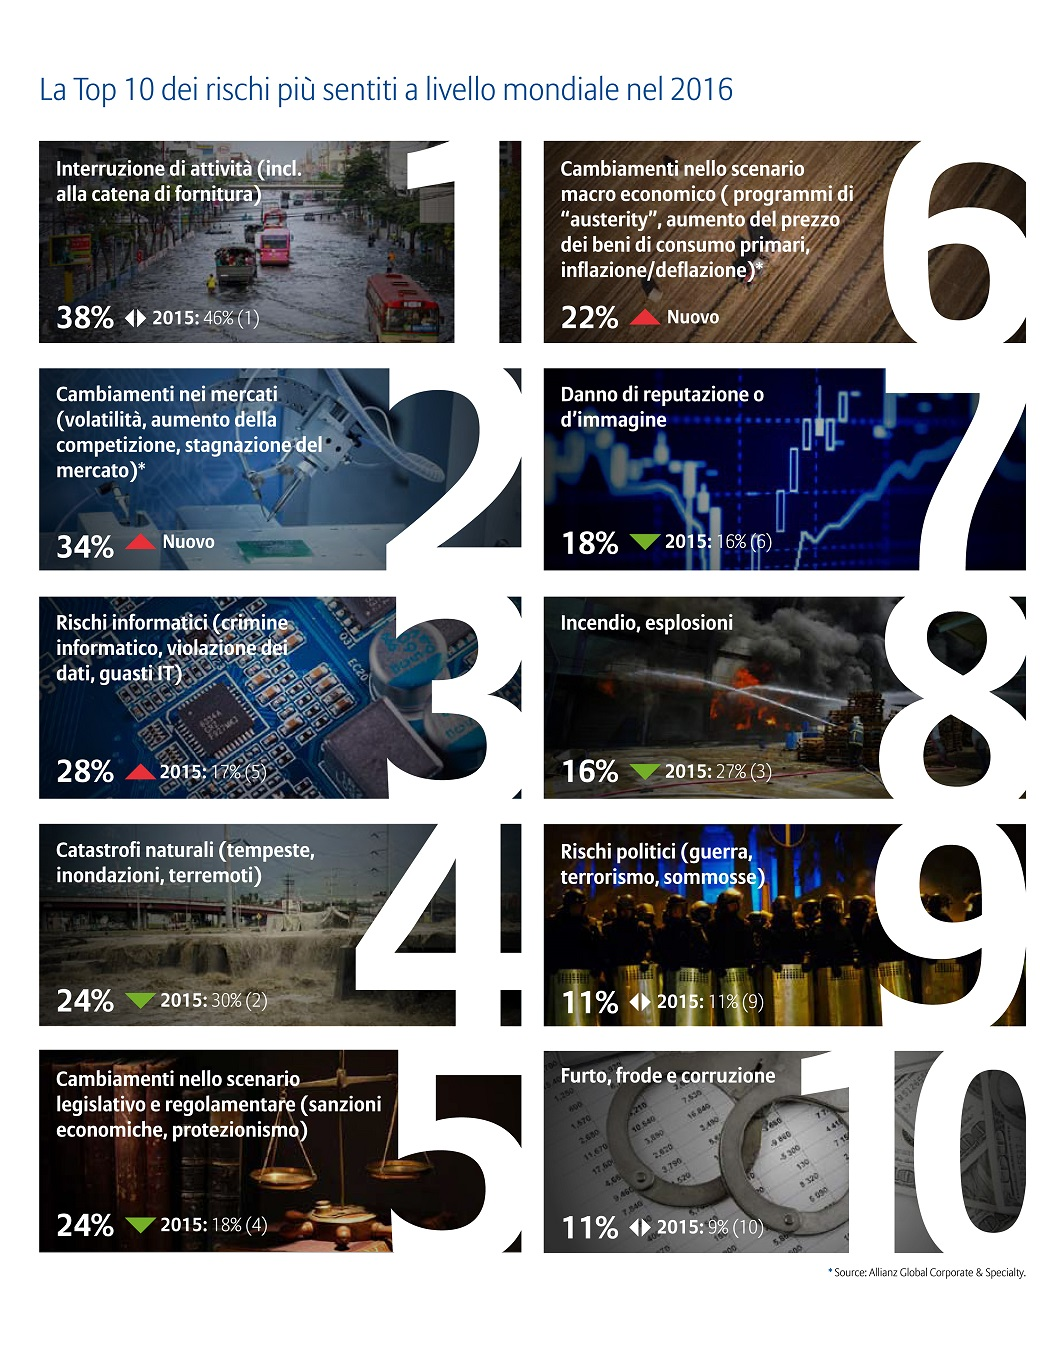 Allianz Risk Barometer - source: Allianz Global Corporate & security